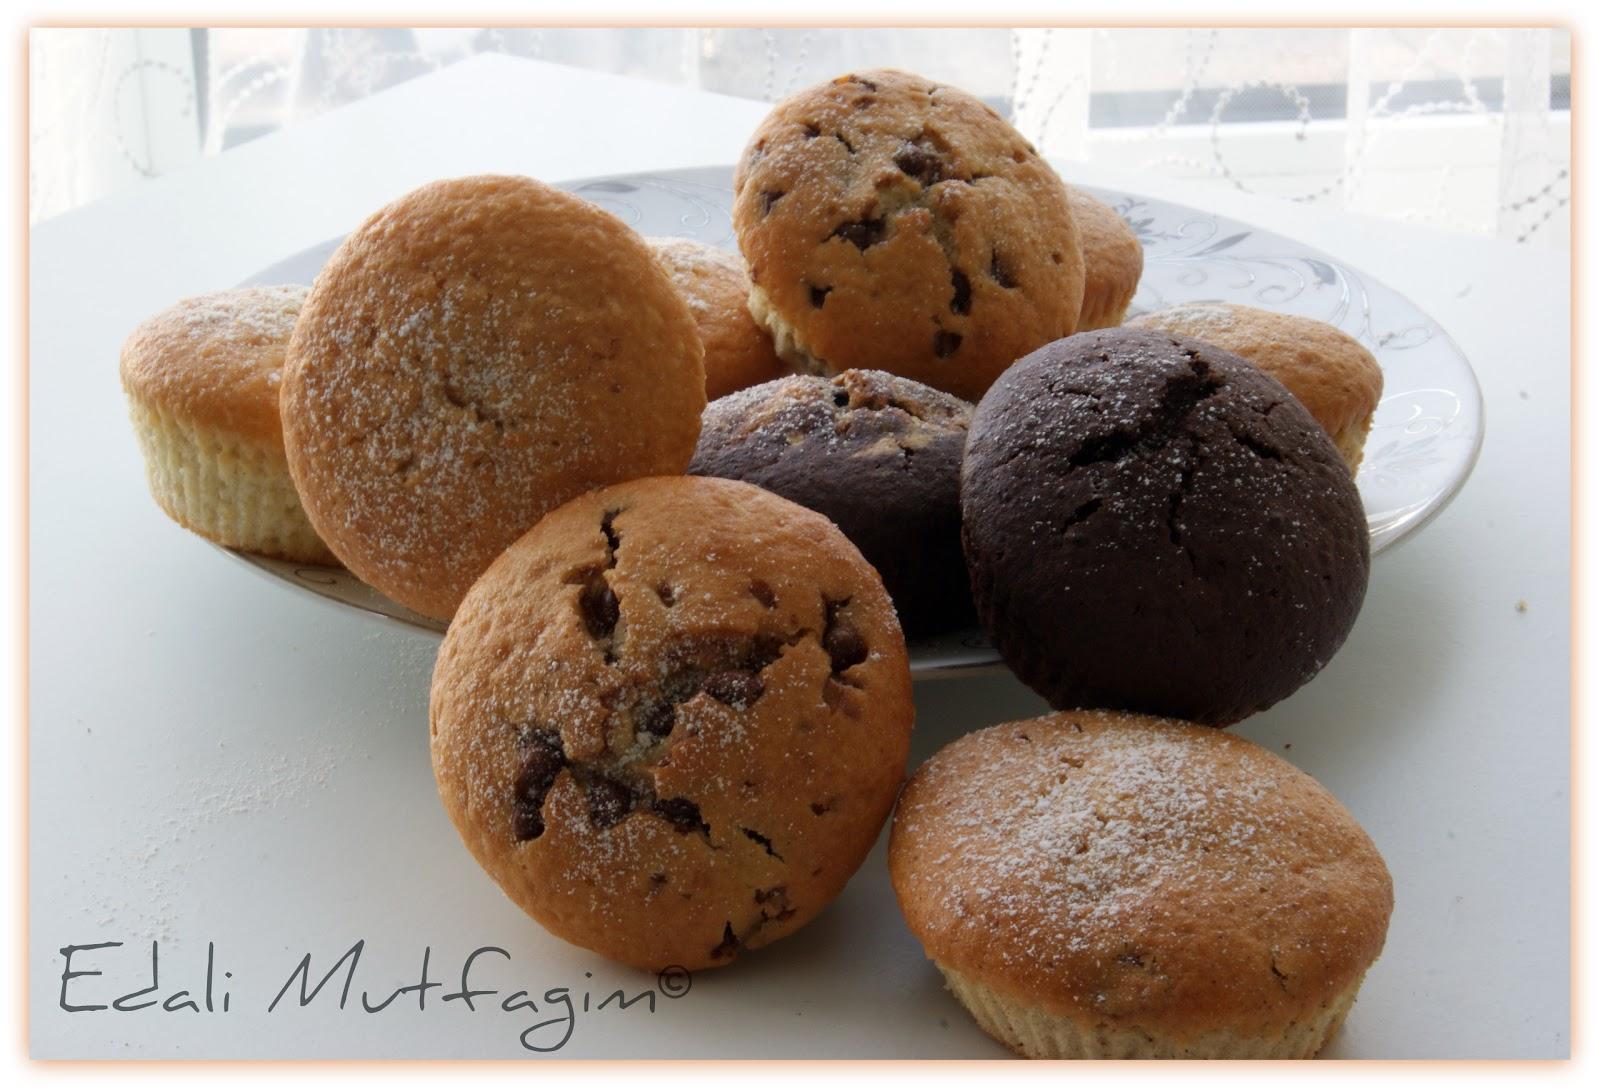 Bademli Minik Kek Tarifi